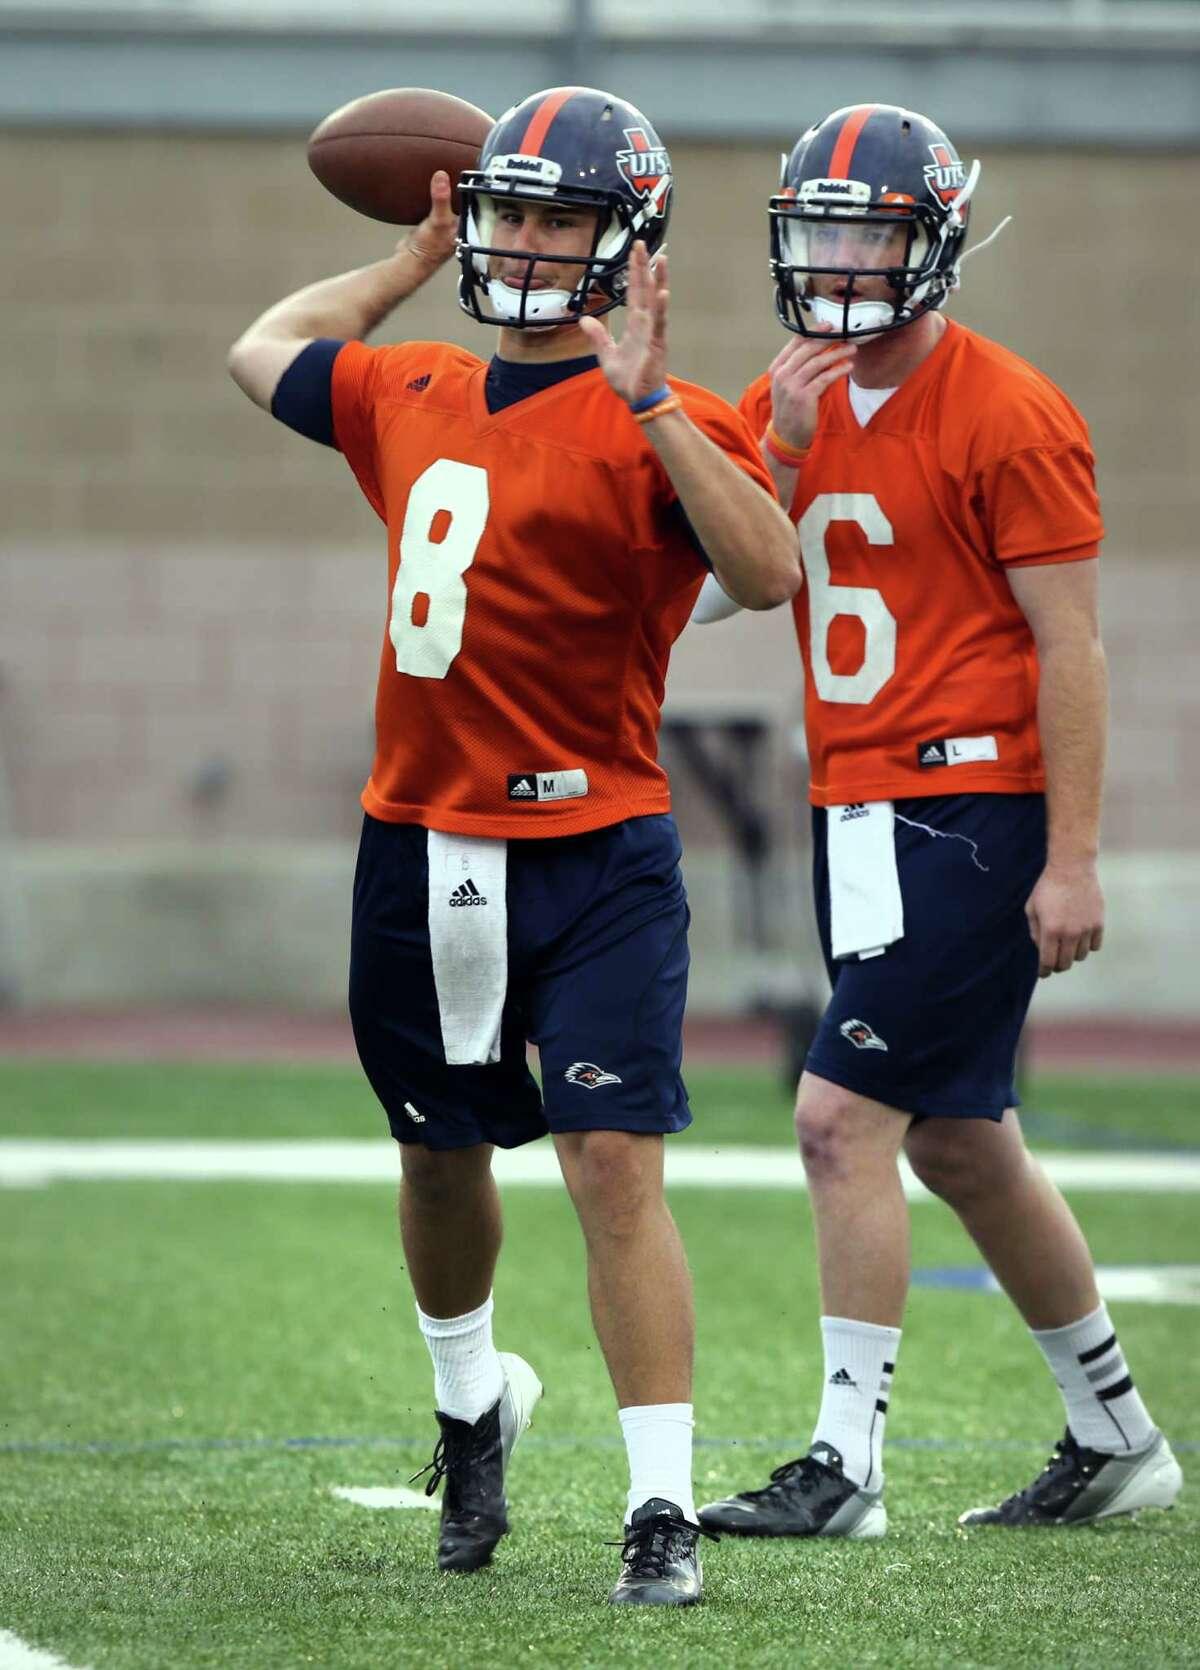 UTSA quarterbacks Eric Soza, left, and Tucker Carter, during a practice on Wednesday, March 20, 2013 at Farris Stadium.